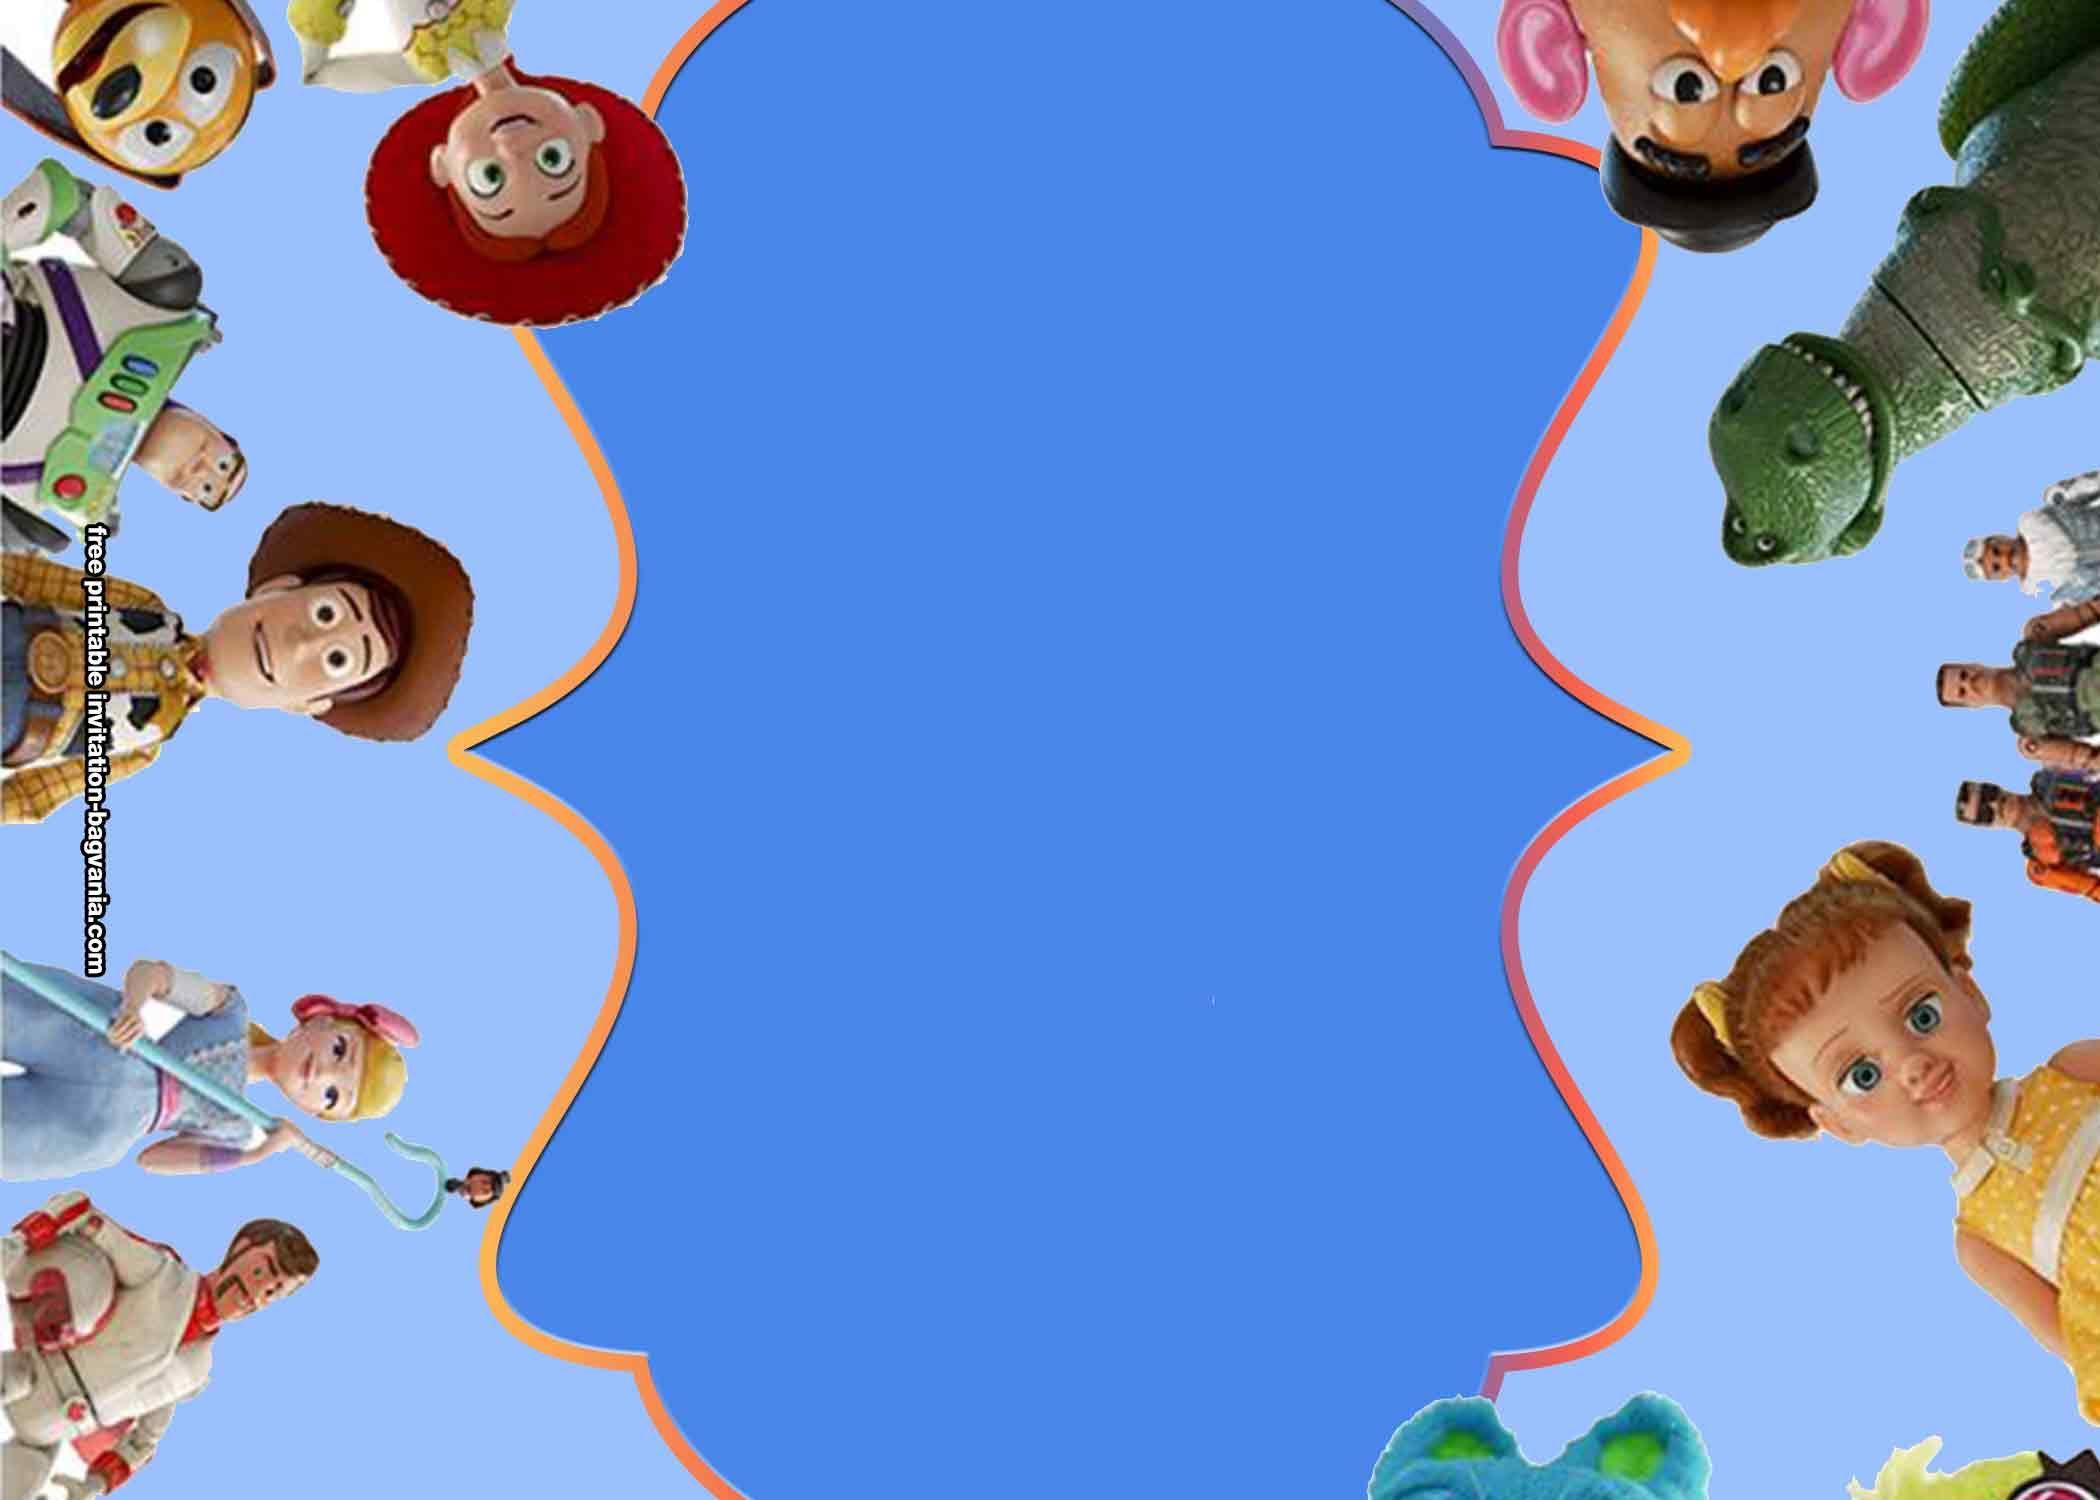 Free Toy Story 4 Birthday Invitation Templates Toy Story Invitations Printable Birthday Invitations Toy Story Birthday